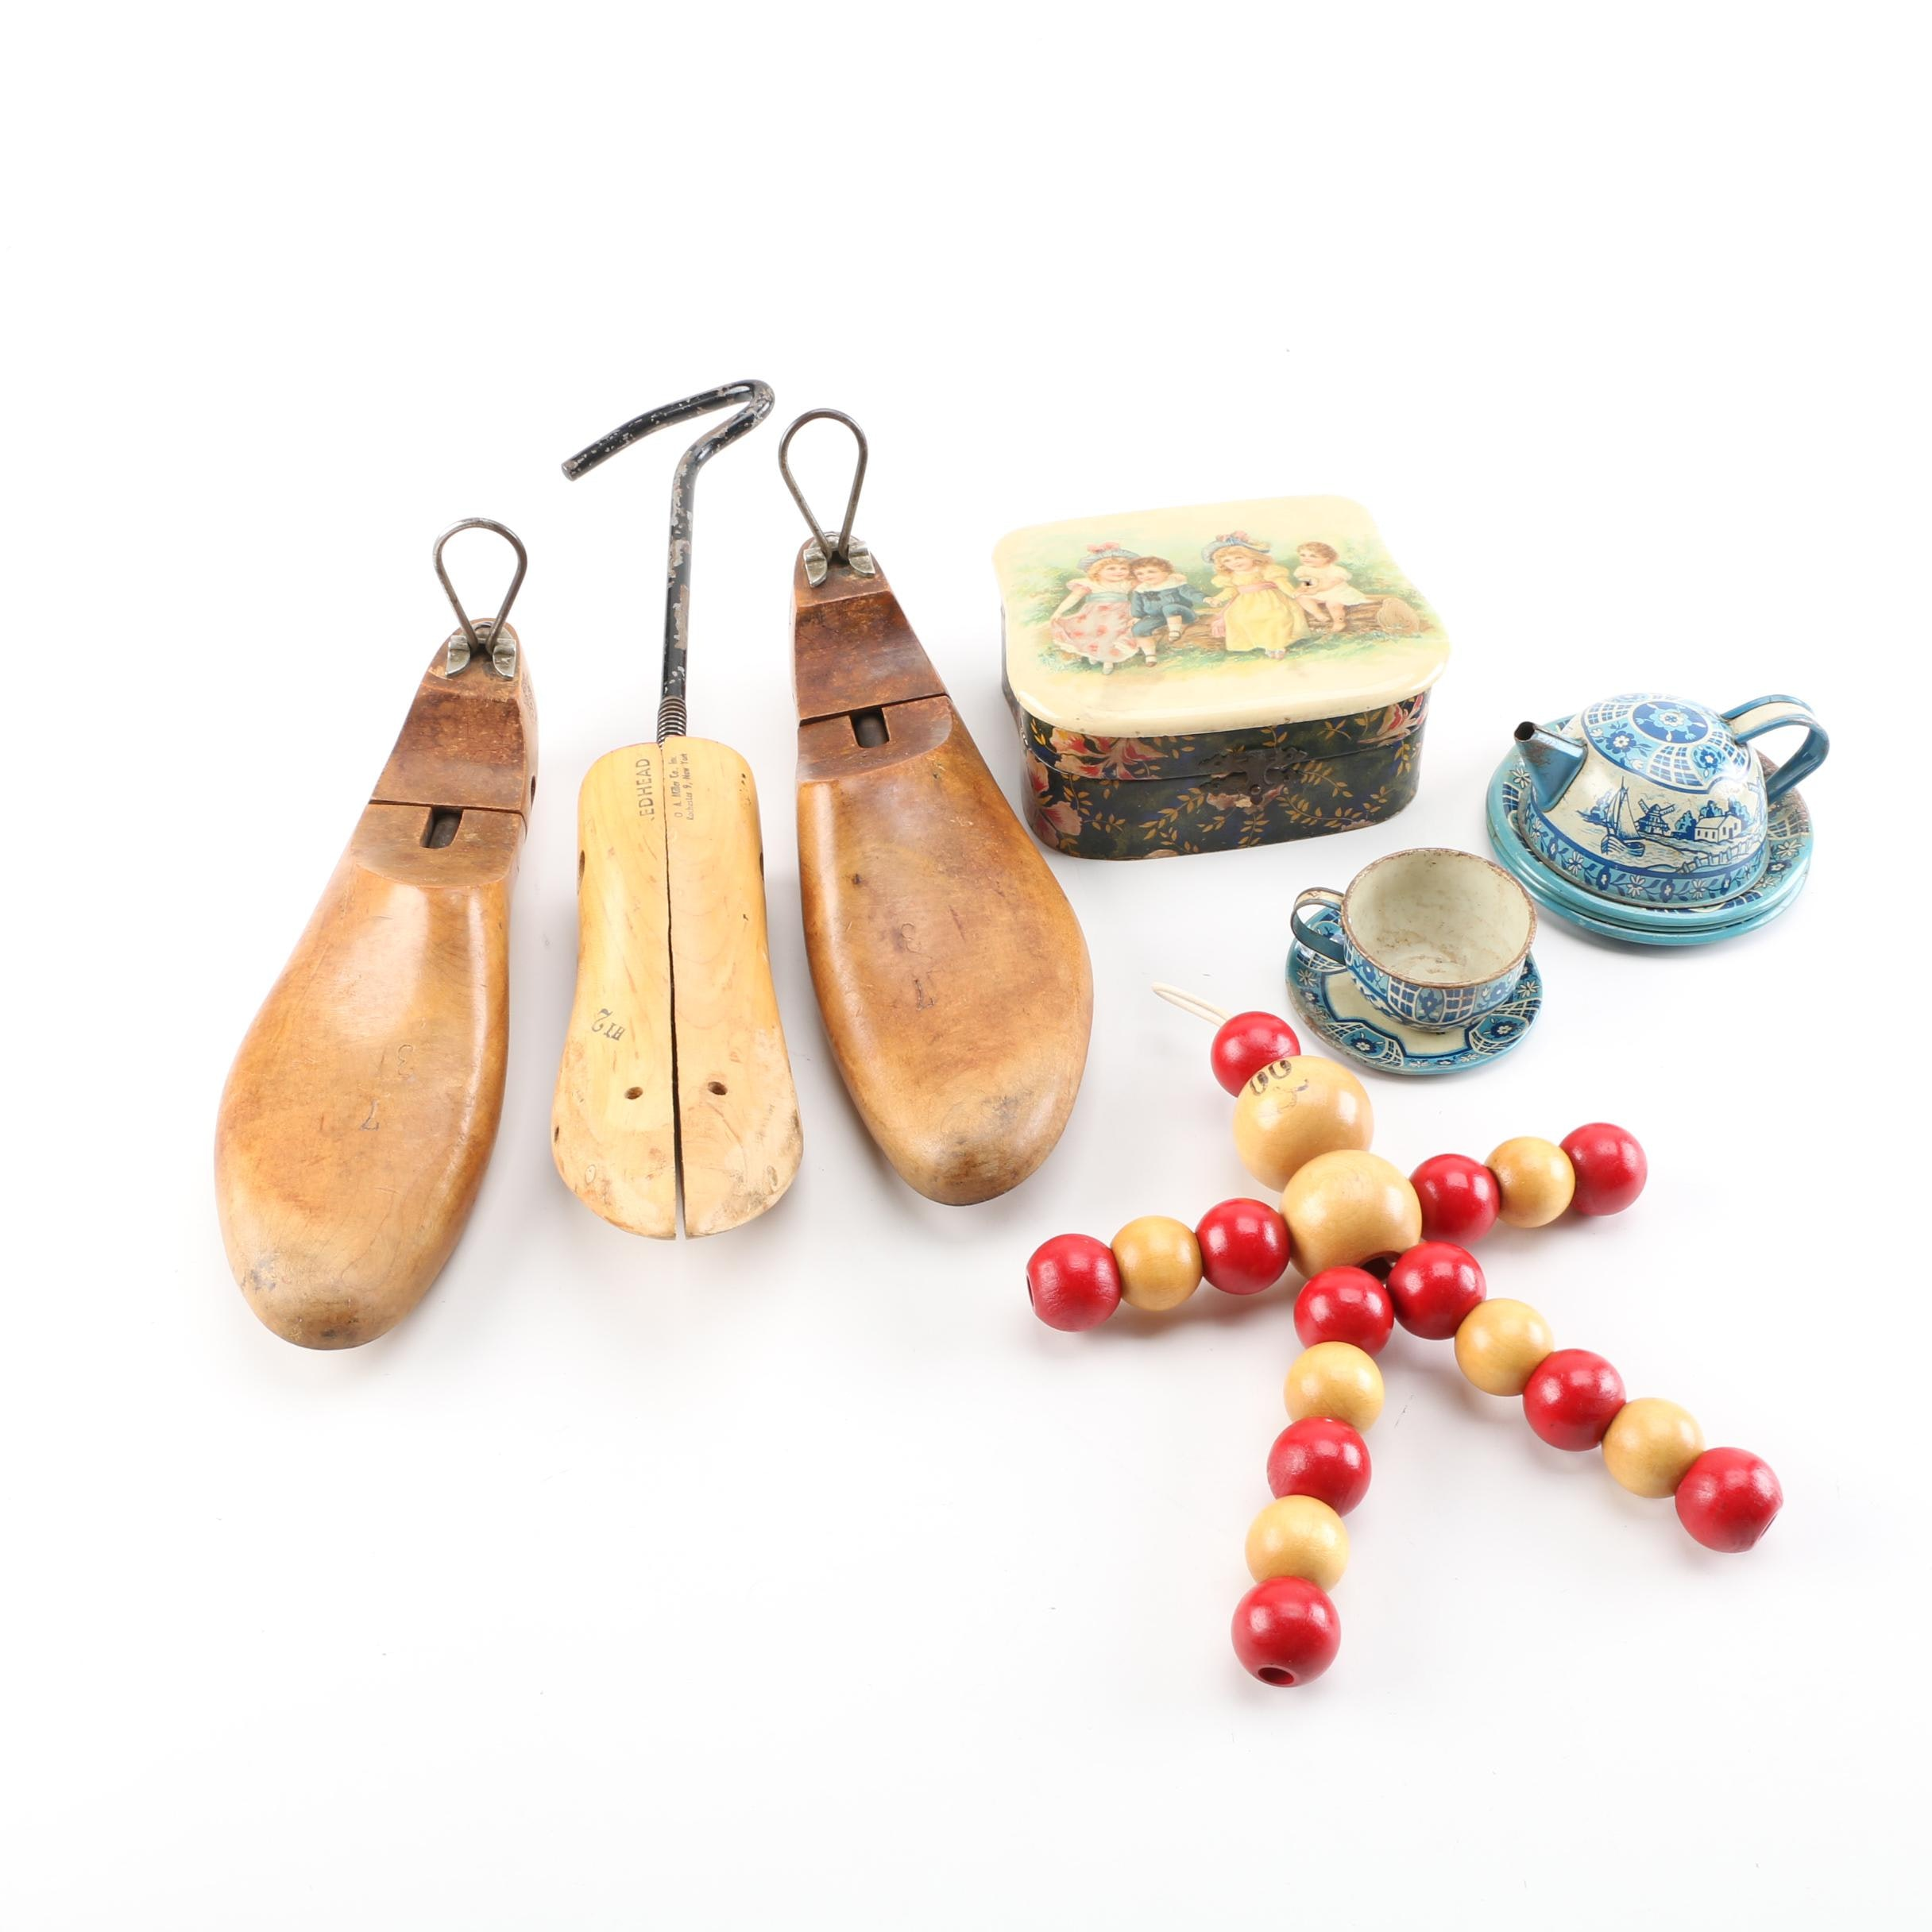 Vintage Tea Set, Trinket Box, Shoe Stretchers, and Bead Figurine